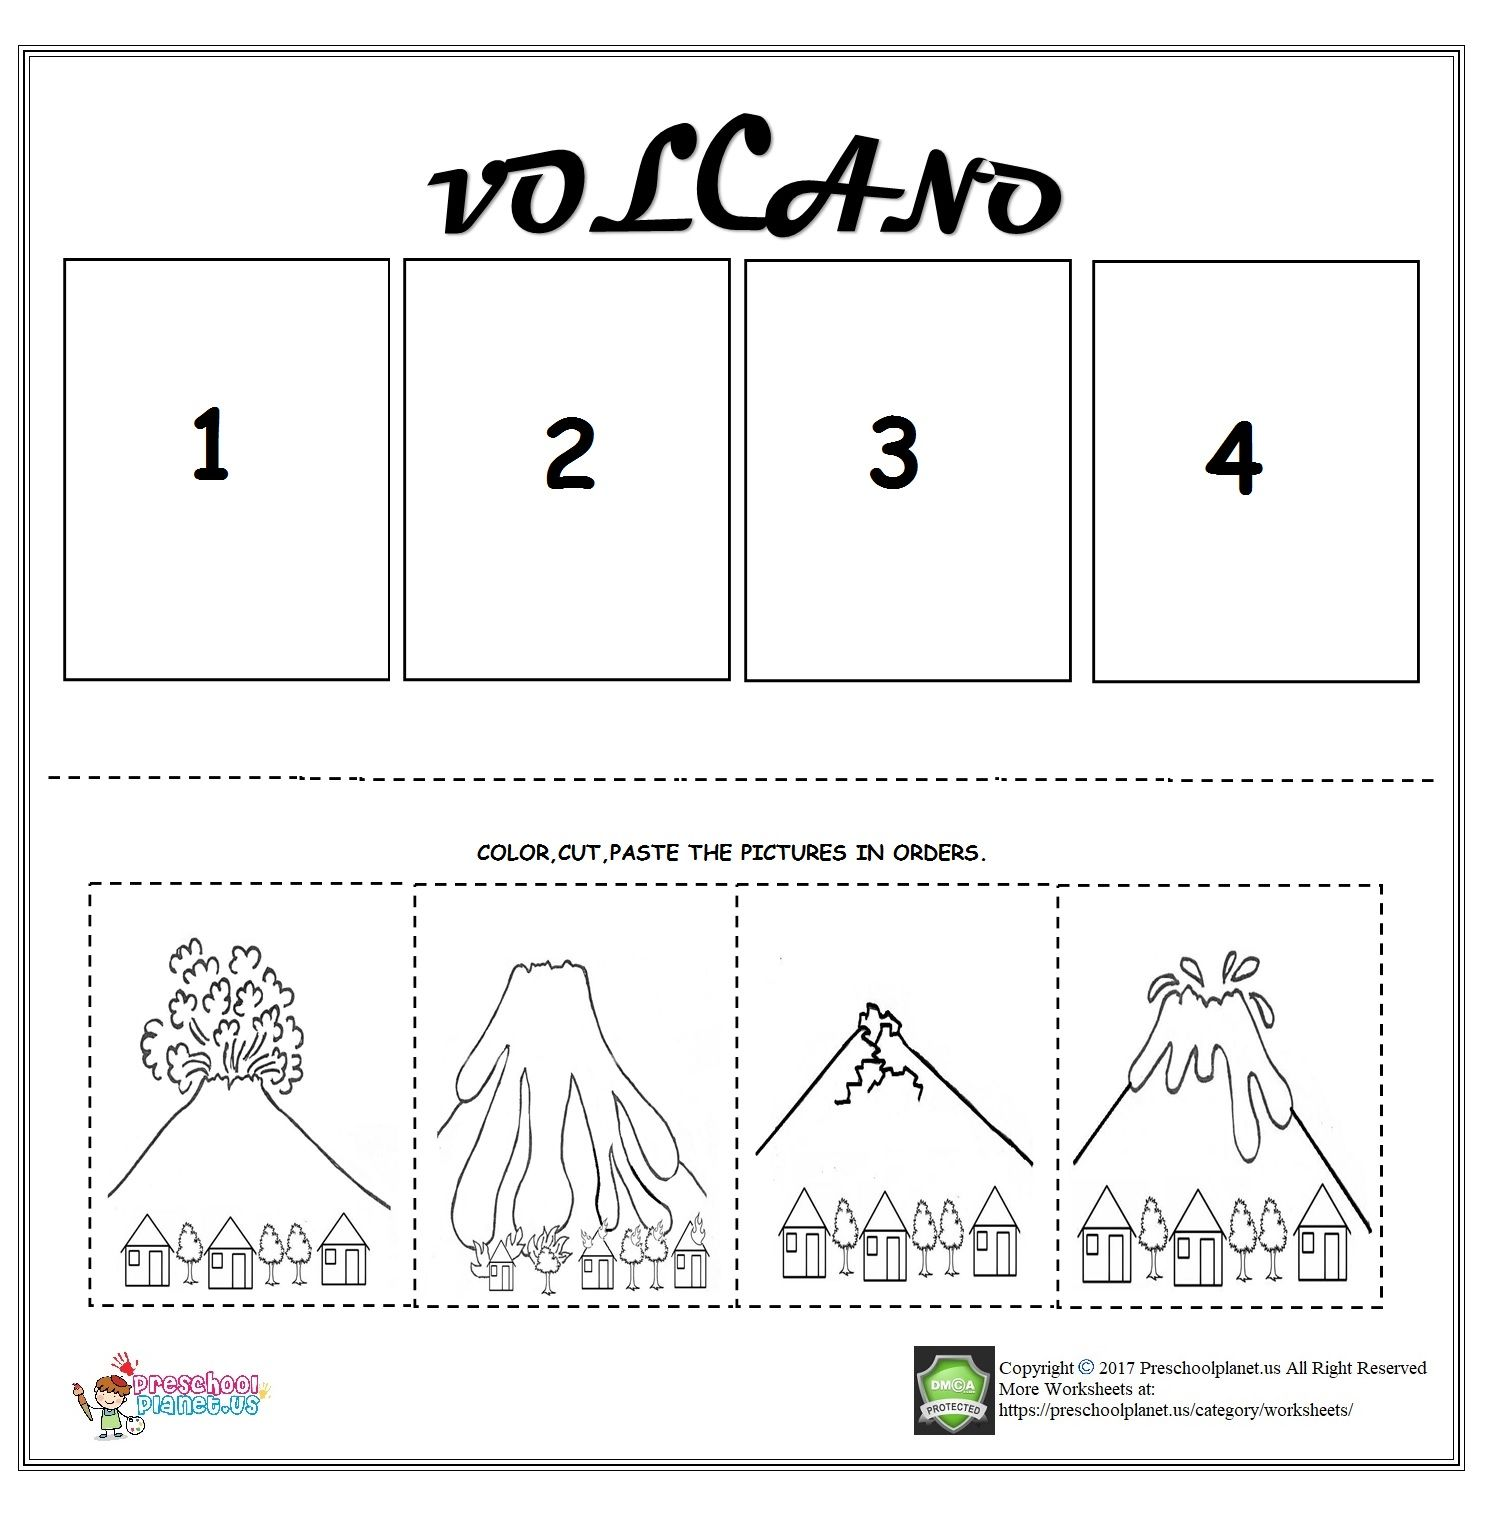 hight resolution of Volcano sequencing worksheet for kids   Kindergarten sequencing worksheets